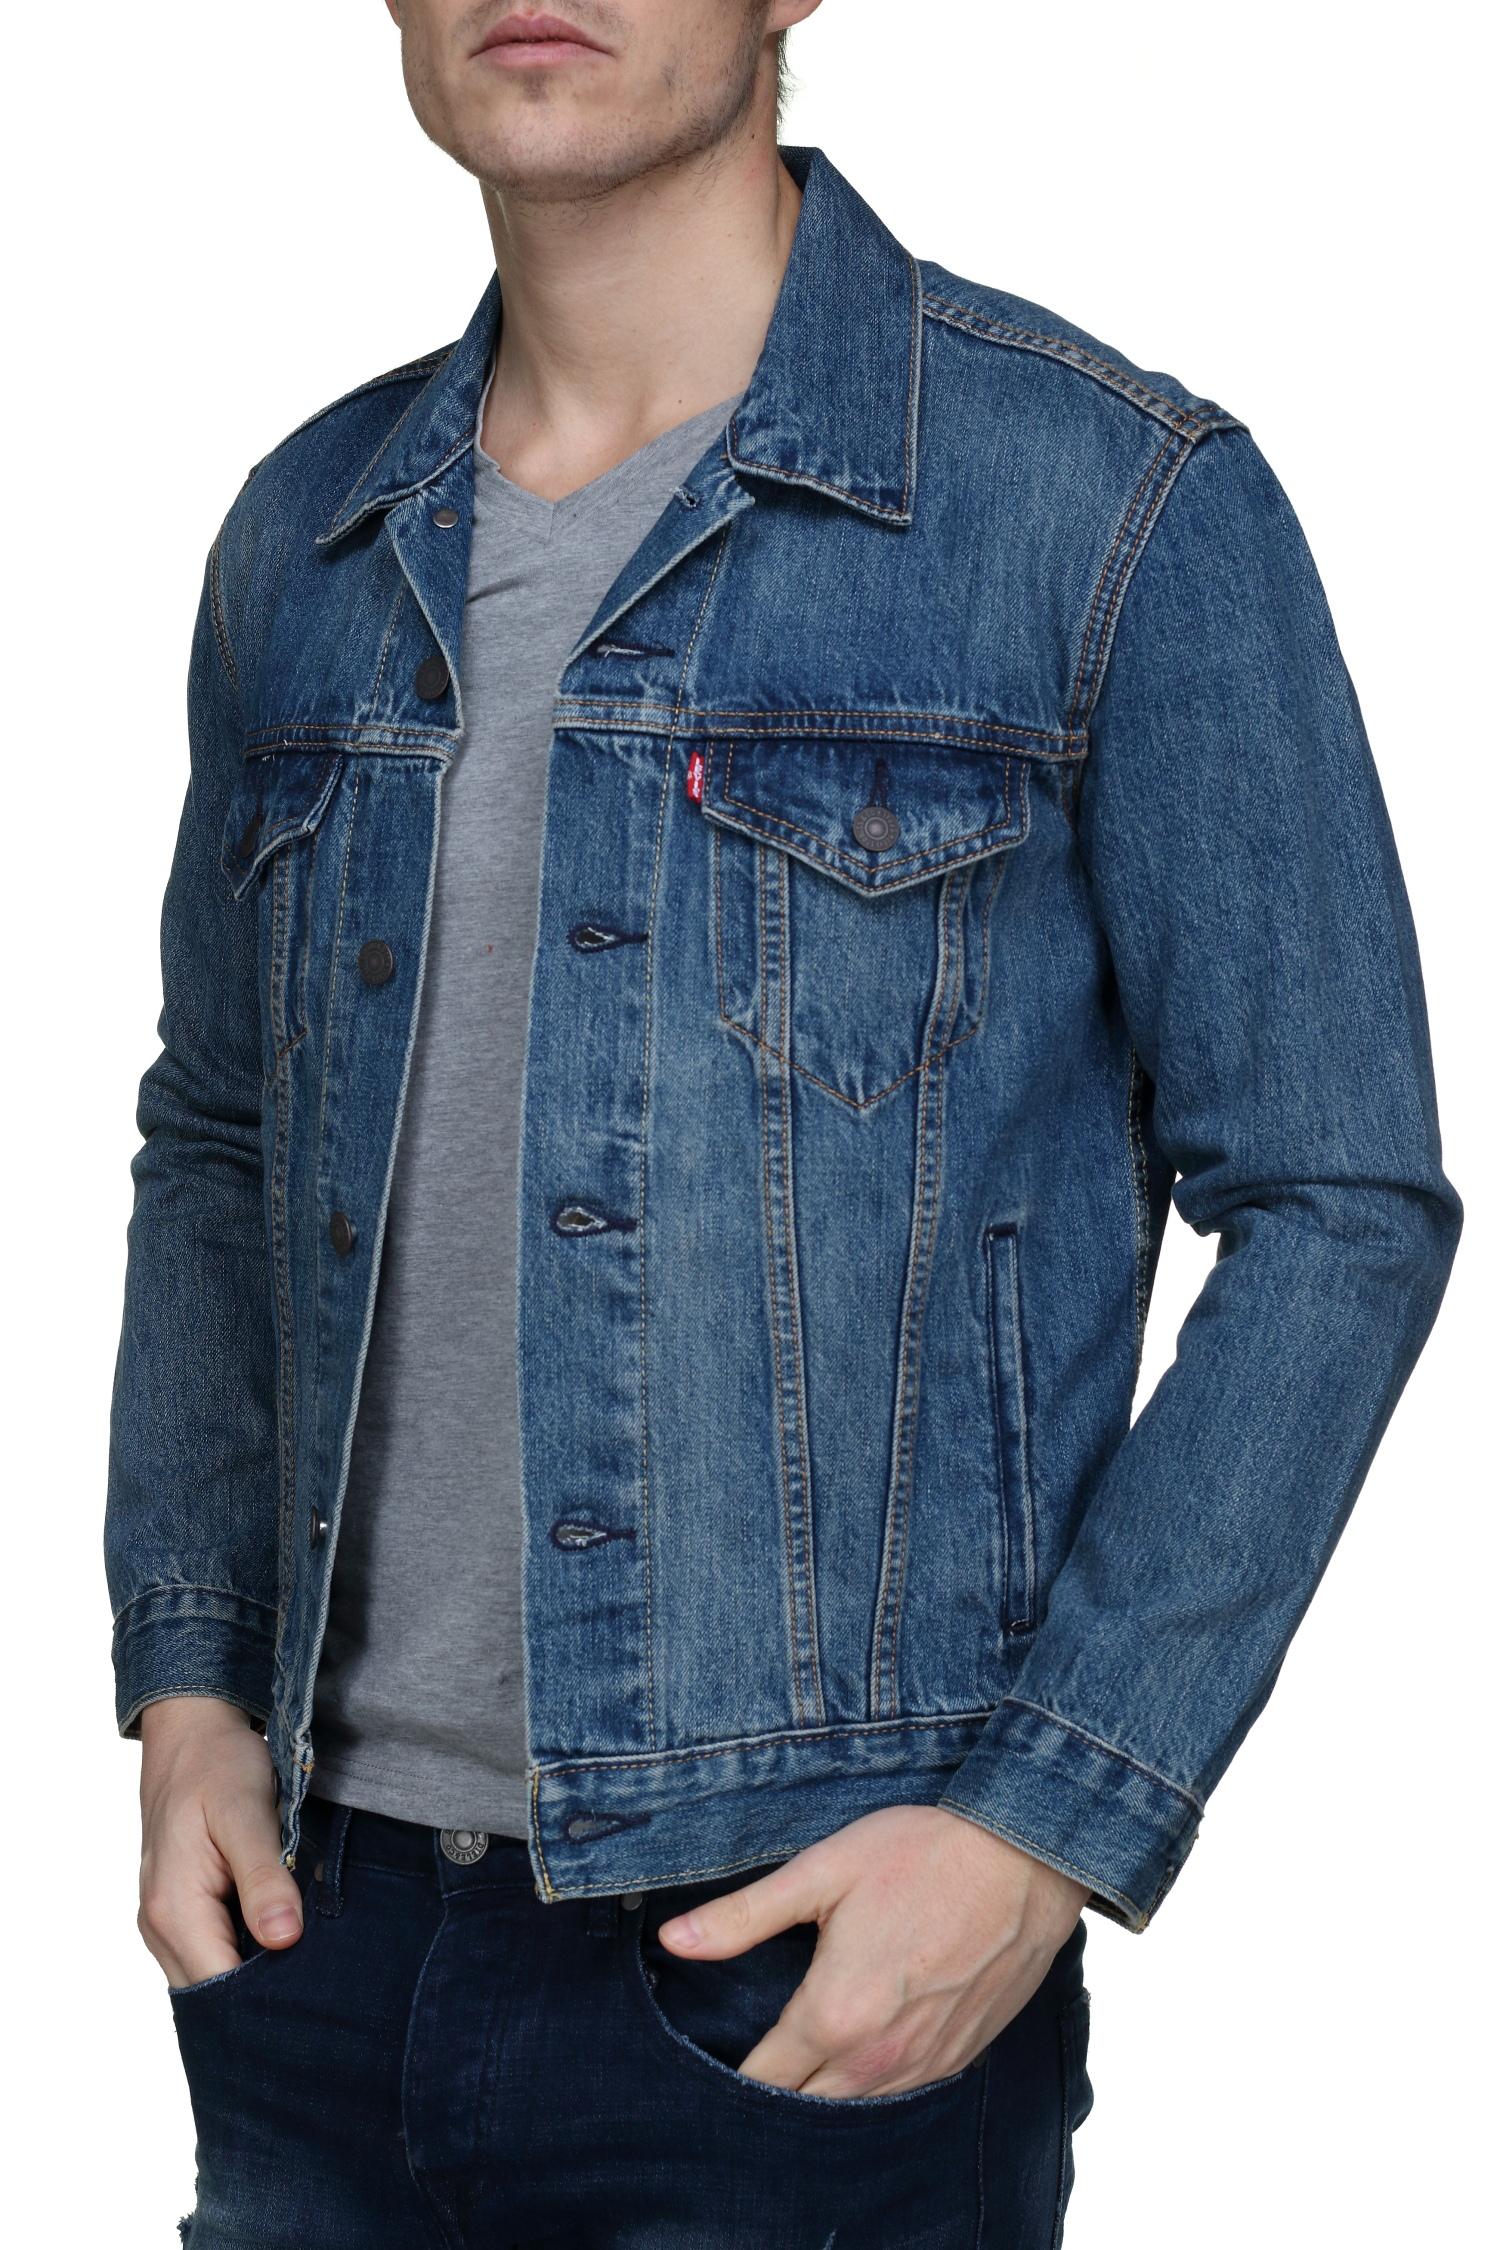 https://www.leadermode.com/198857/levis-72334-0354-jeans.jpg